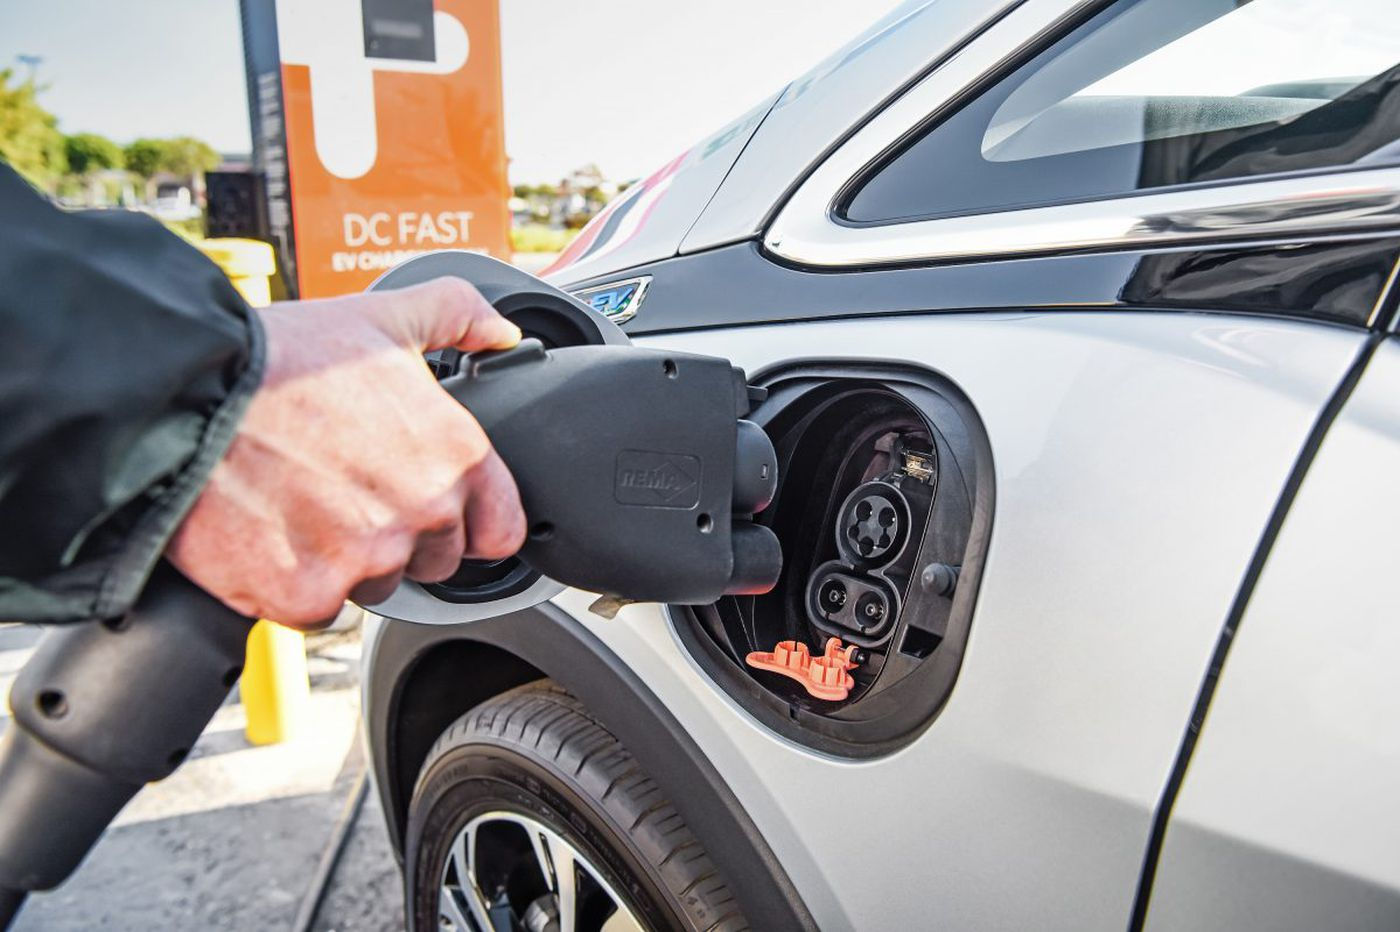 Bmw Knocks 10k Off Electric Vehicle Price In N J